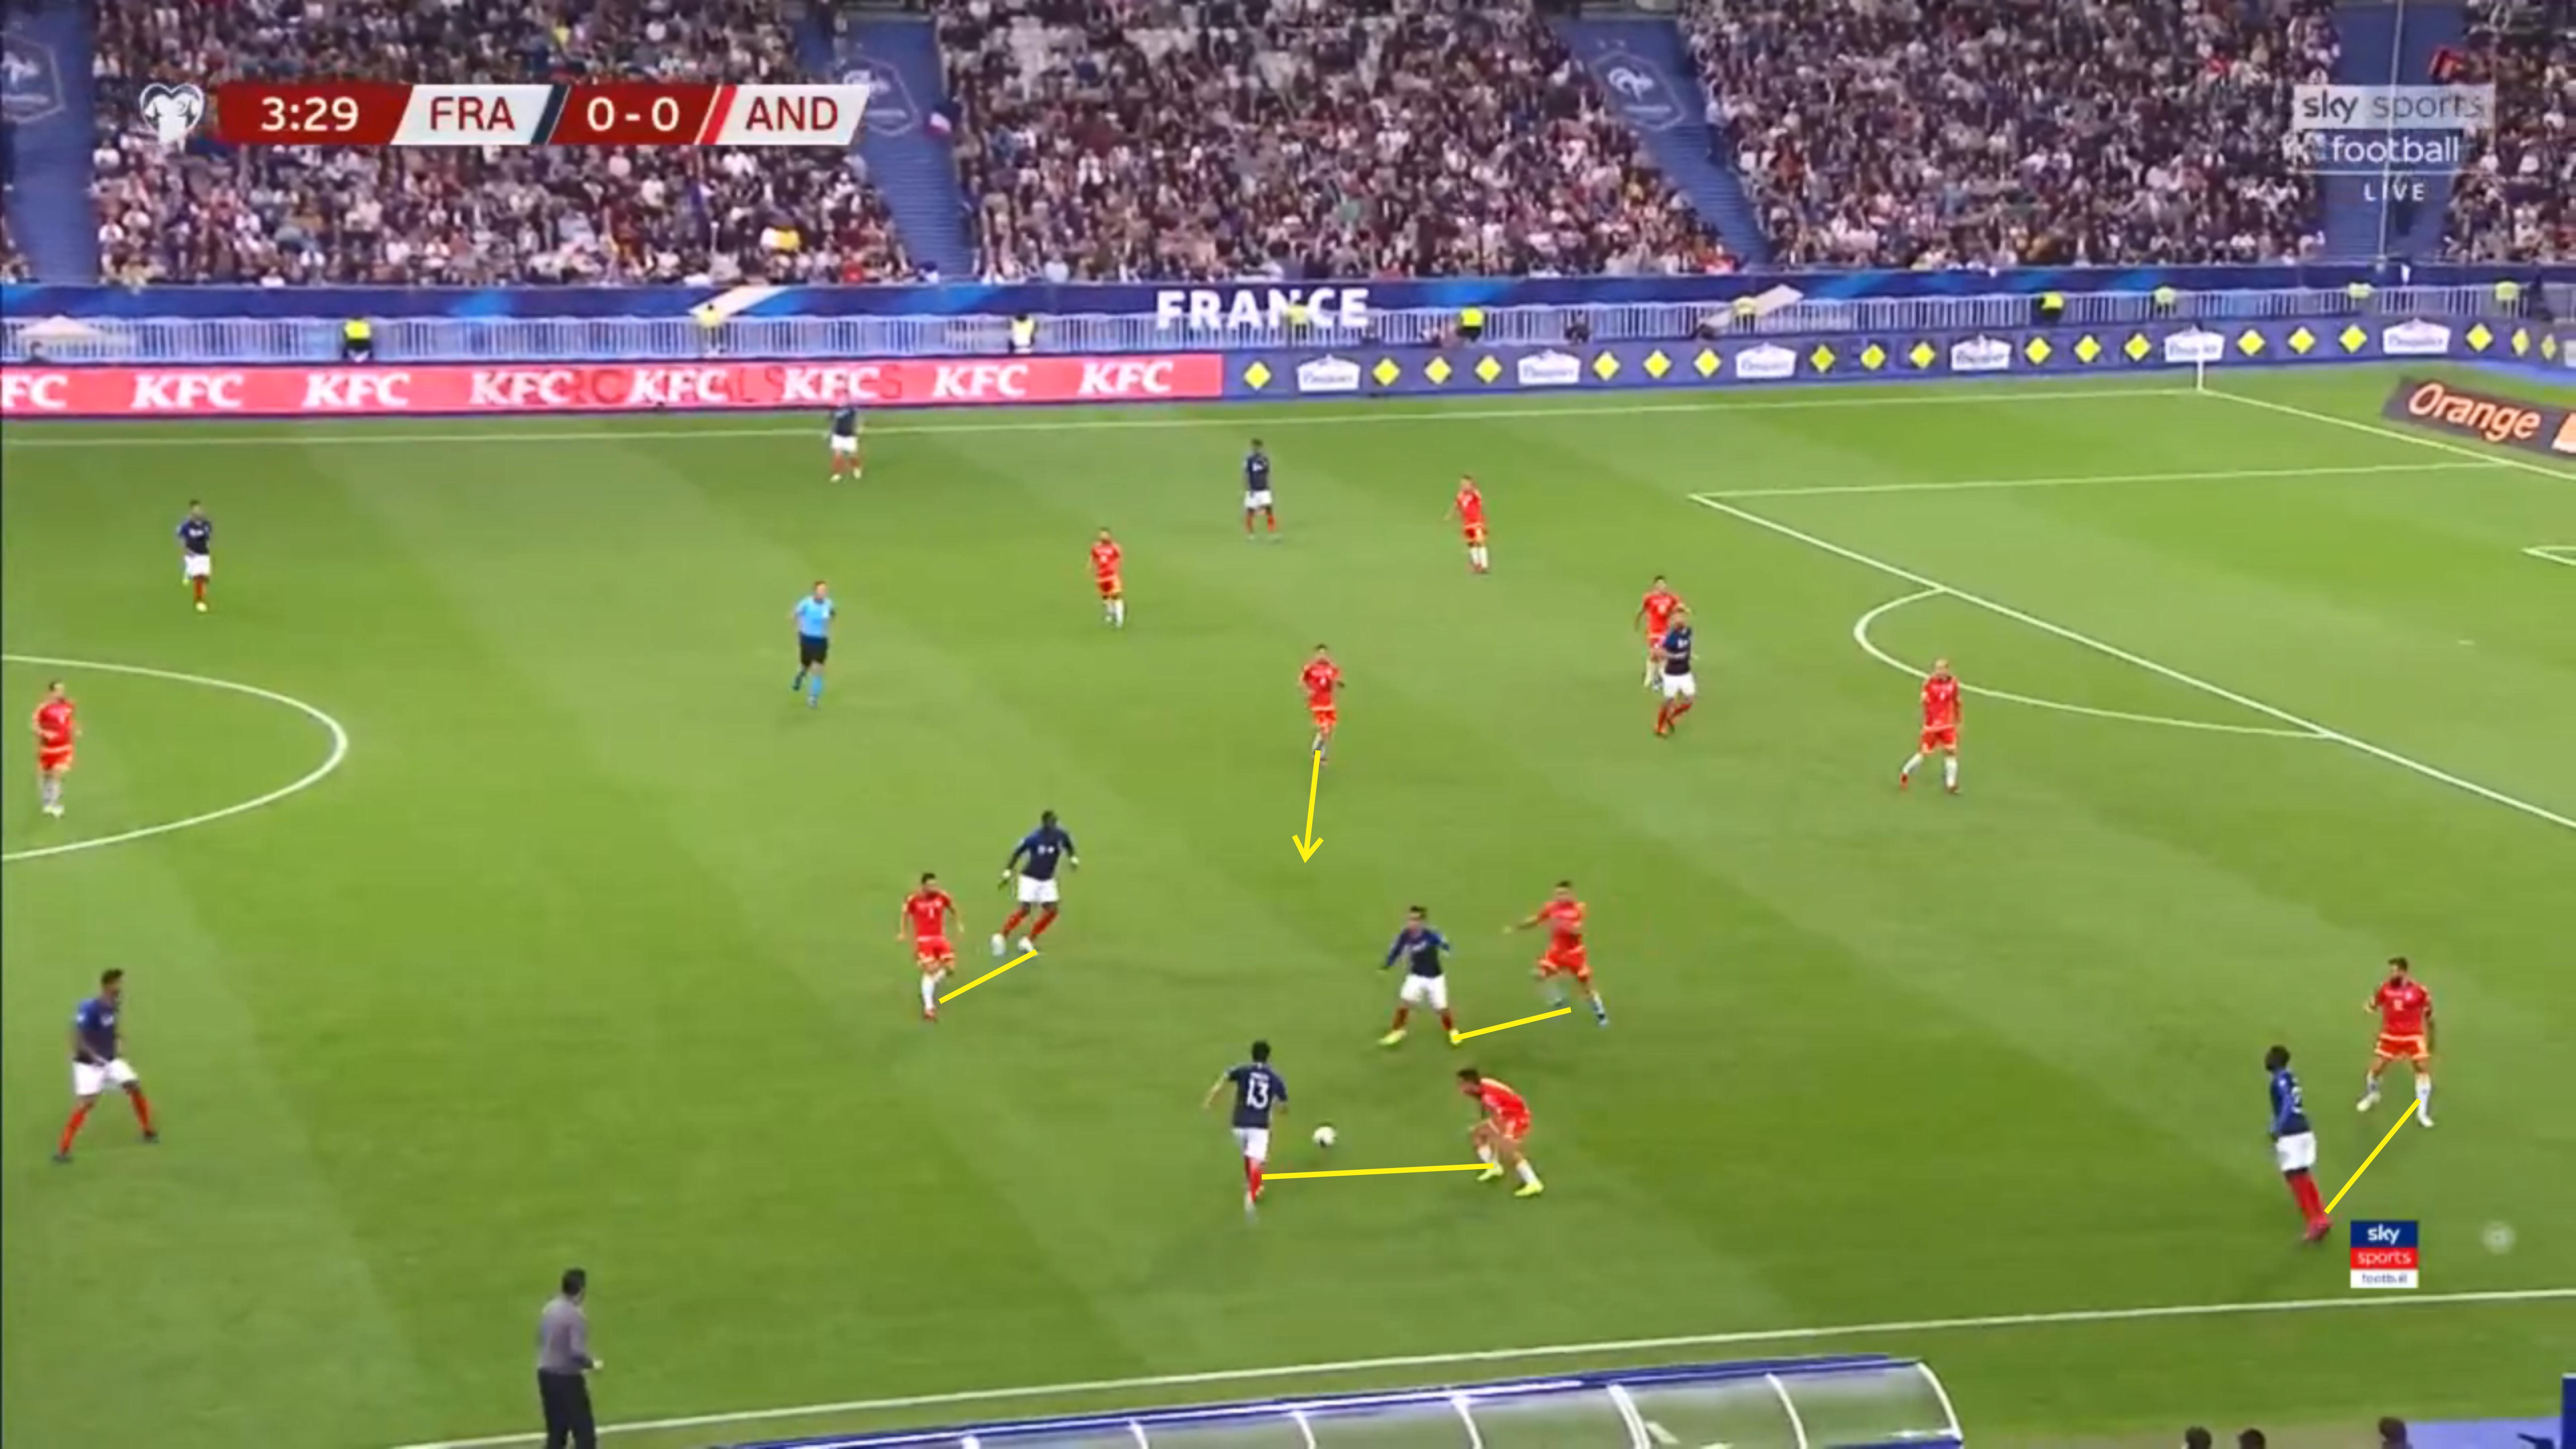 Euro 2020 Qualifiers: France vs Andorra - tactical analysis tactics